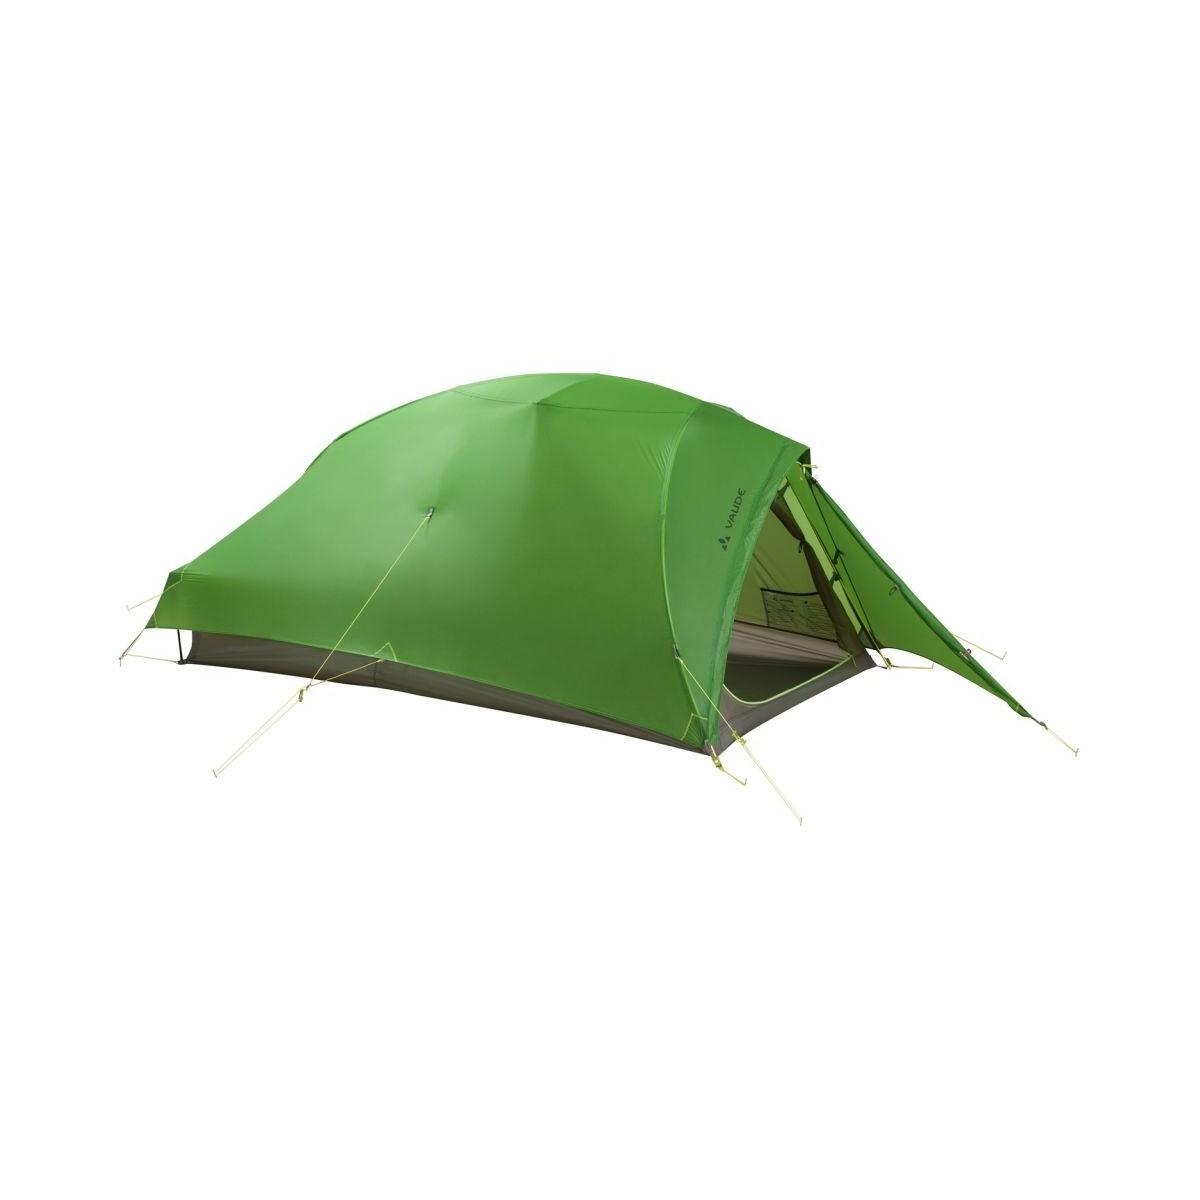 VAUDE telts HOGAN SUL 2P